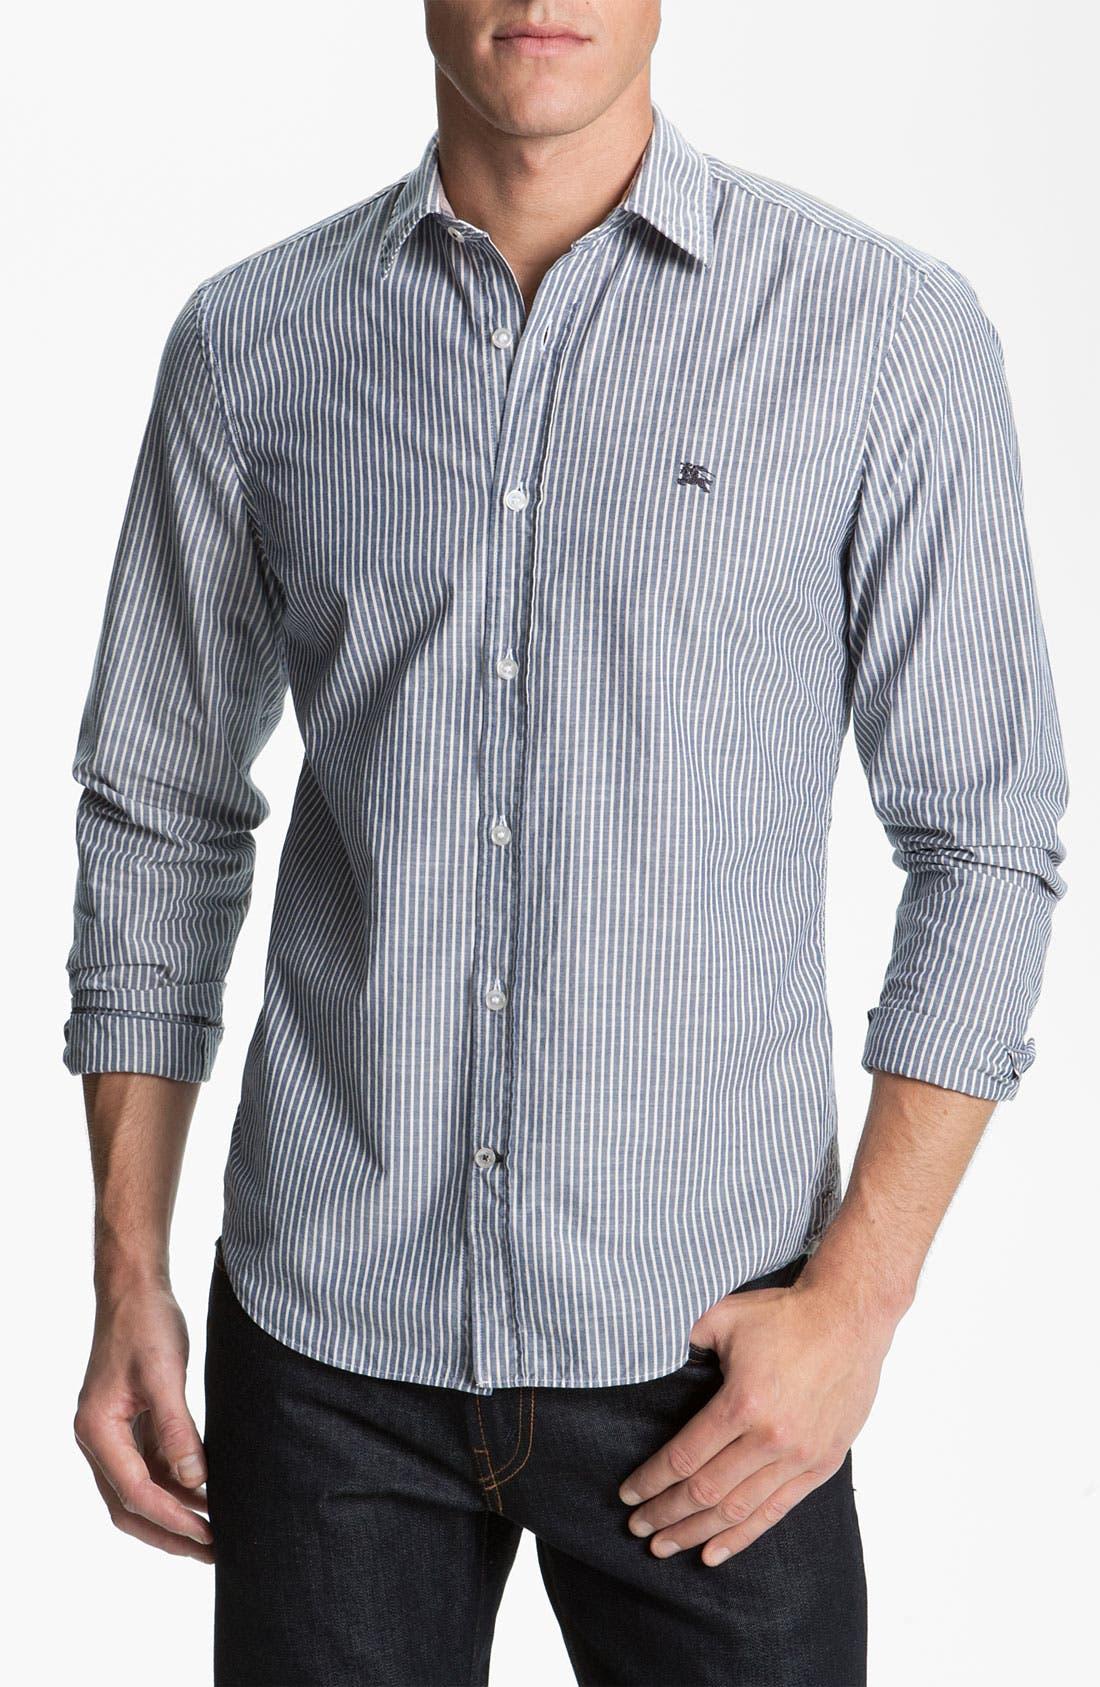 Main Image - Burberry Brit Stripe Trim Fit Sport Shirt